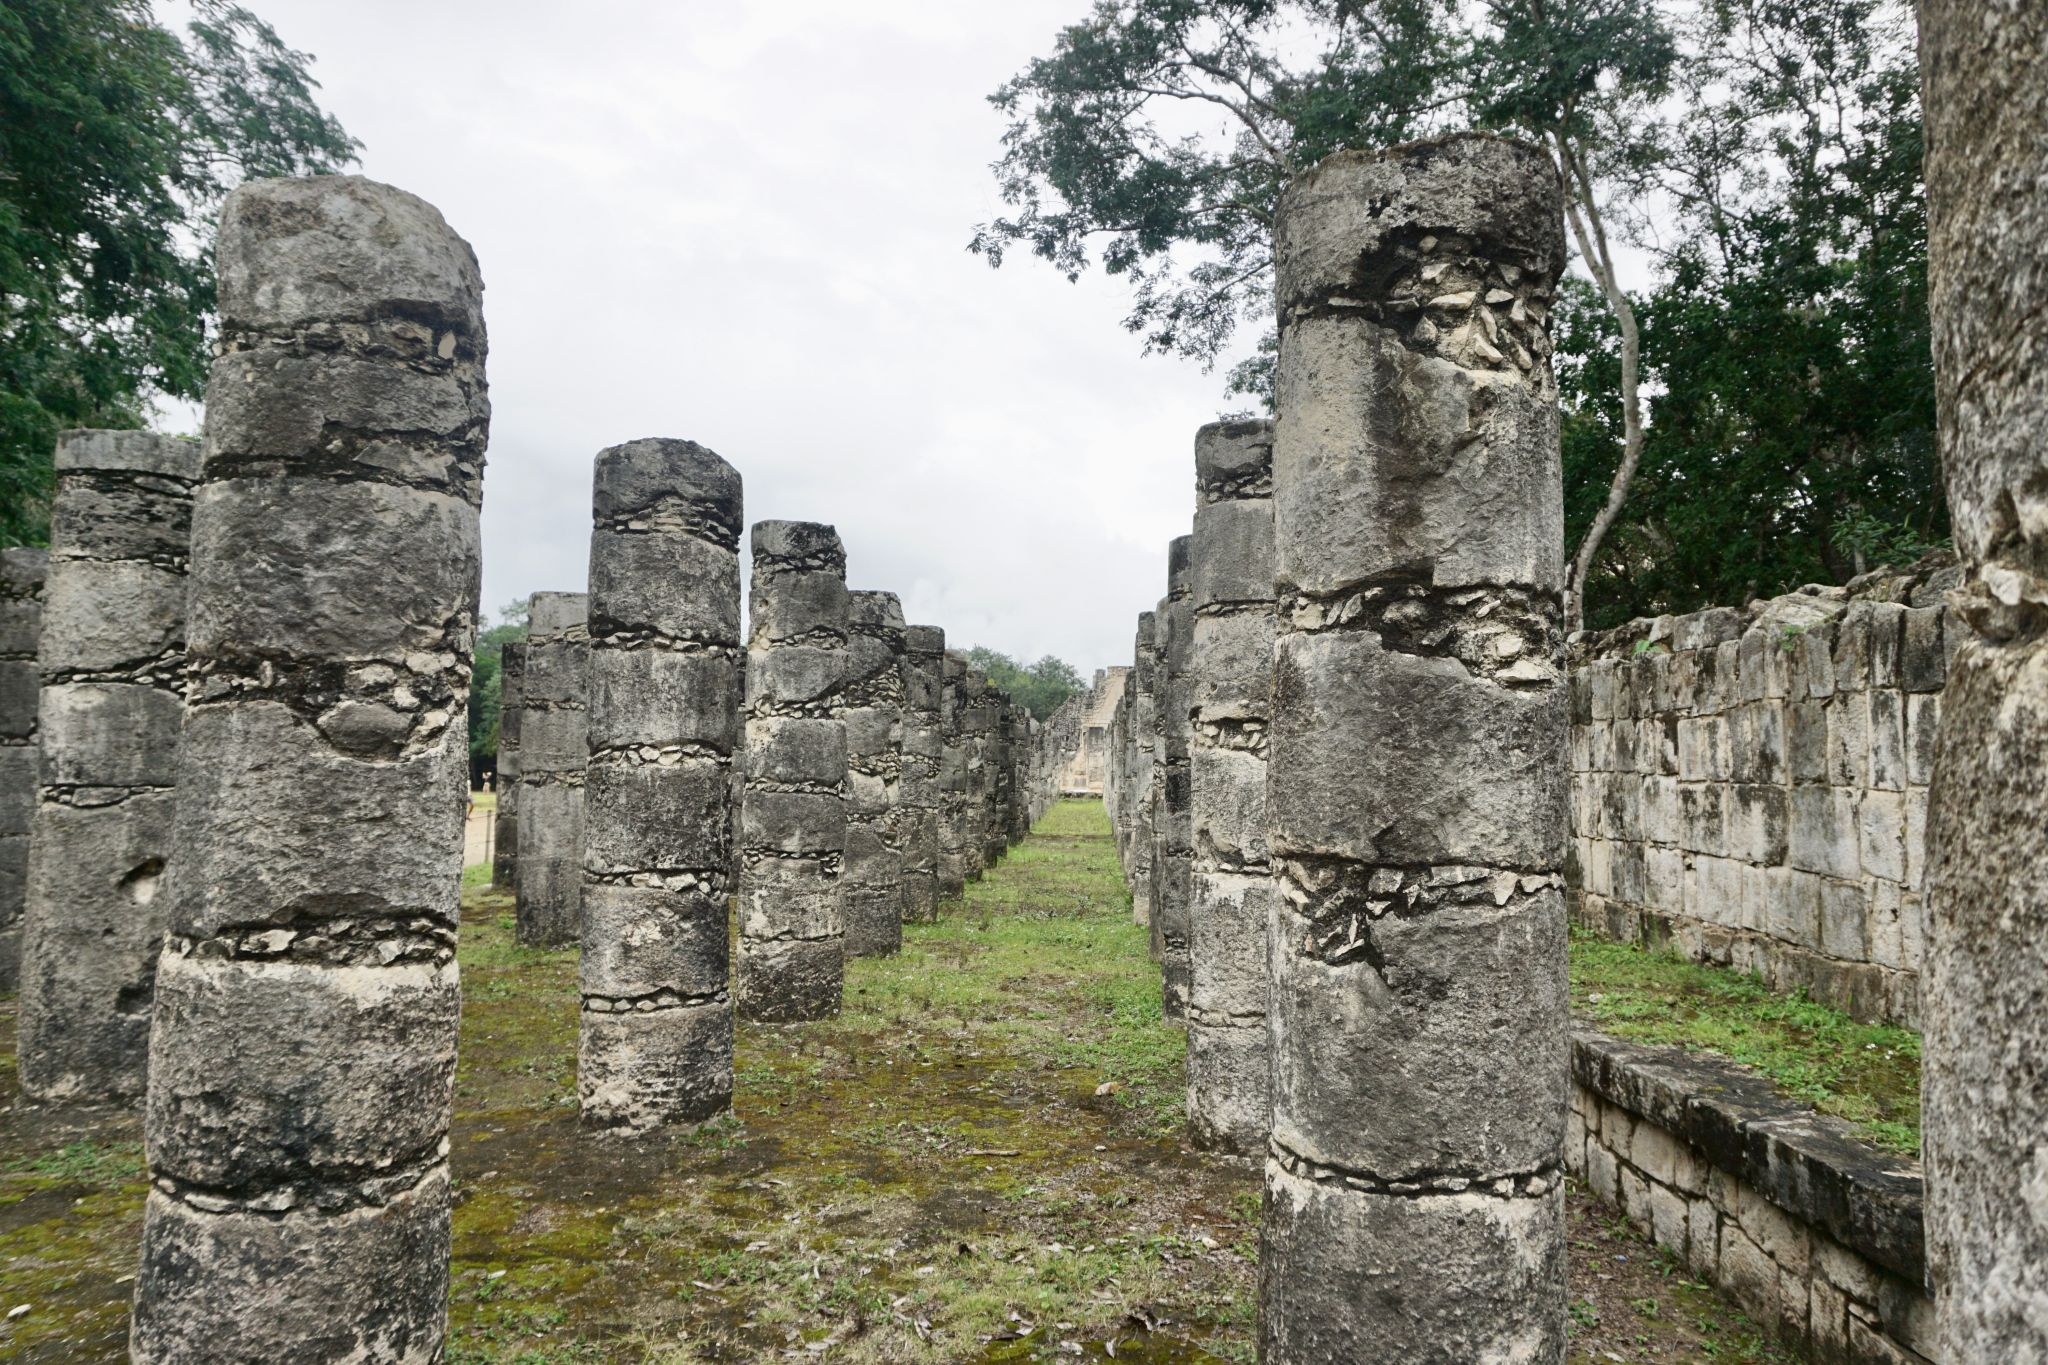 Grupo de las Mil Columnas in Chichen Itzá